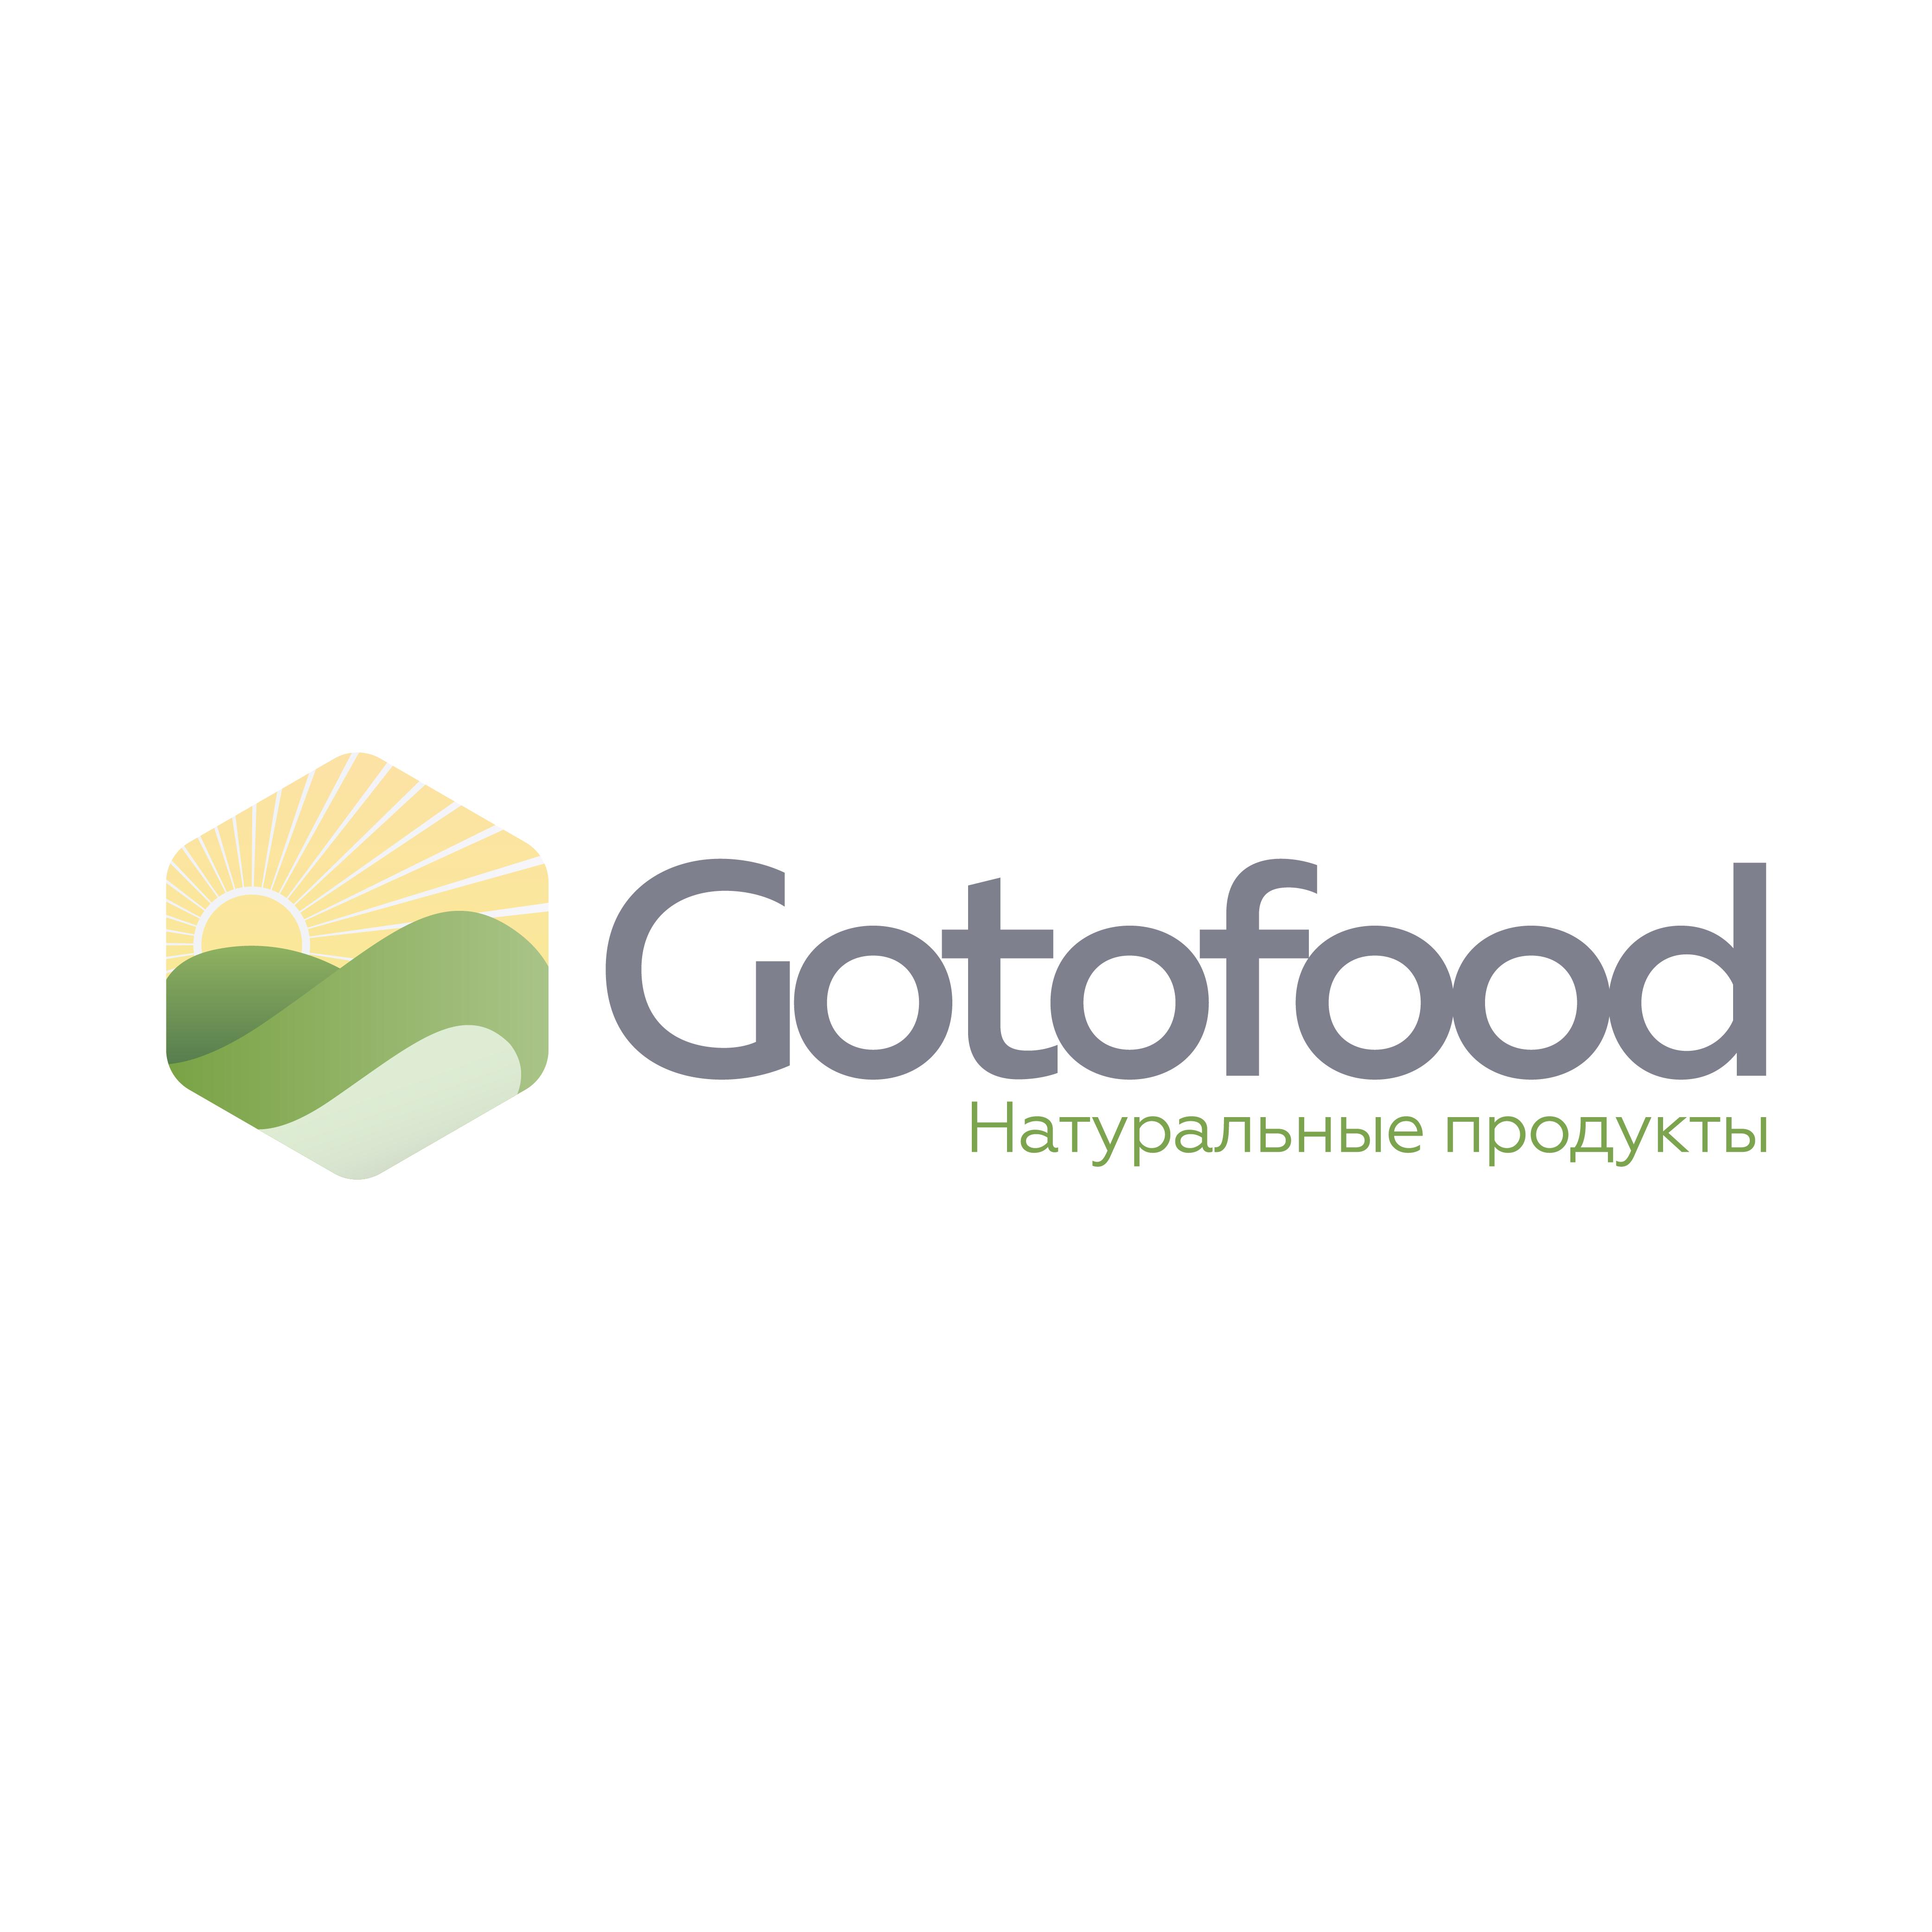 Логотип интернет-магазина здоровой еды фото f_6795cd2c8e5844aa.png